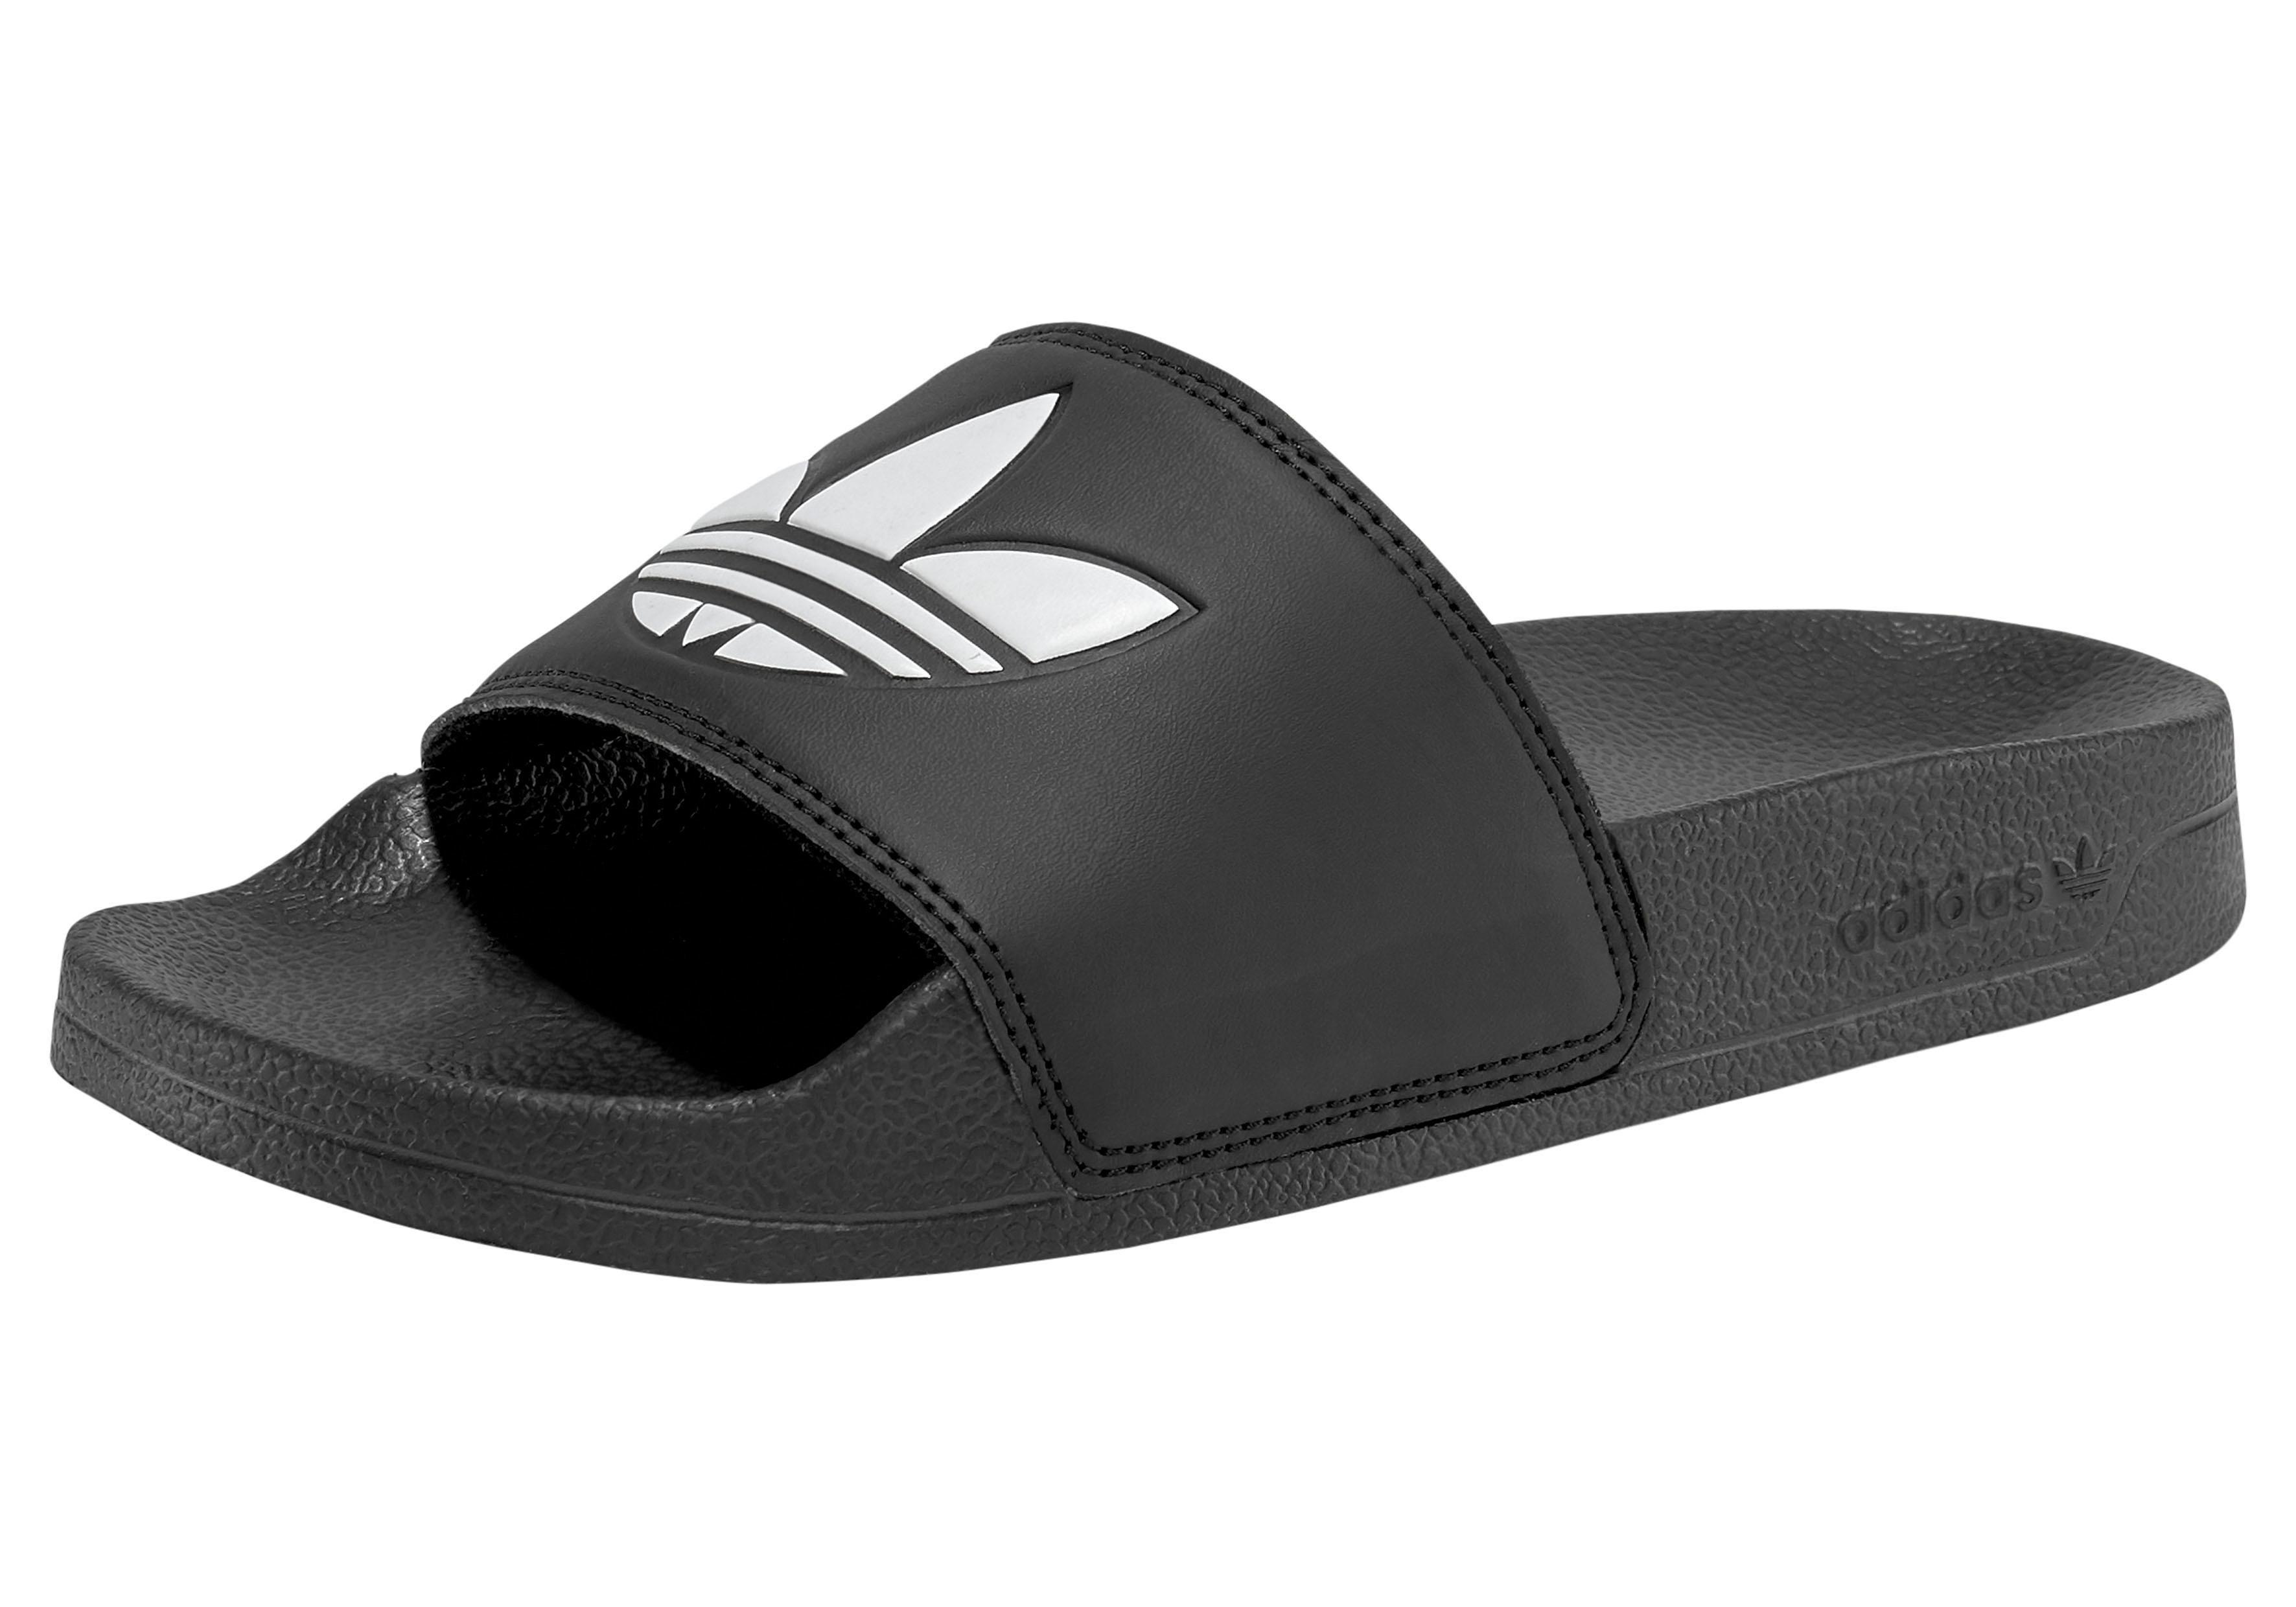 adidas Originals badslippers »ADILETTE LITE J« goedkoop op otto.nl kopen